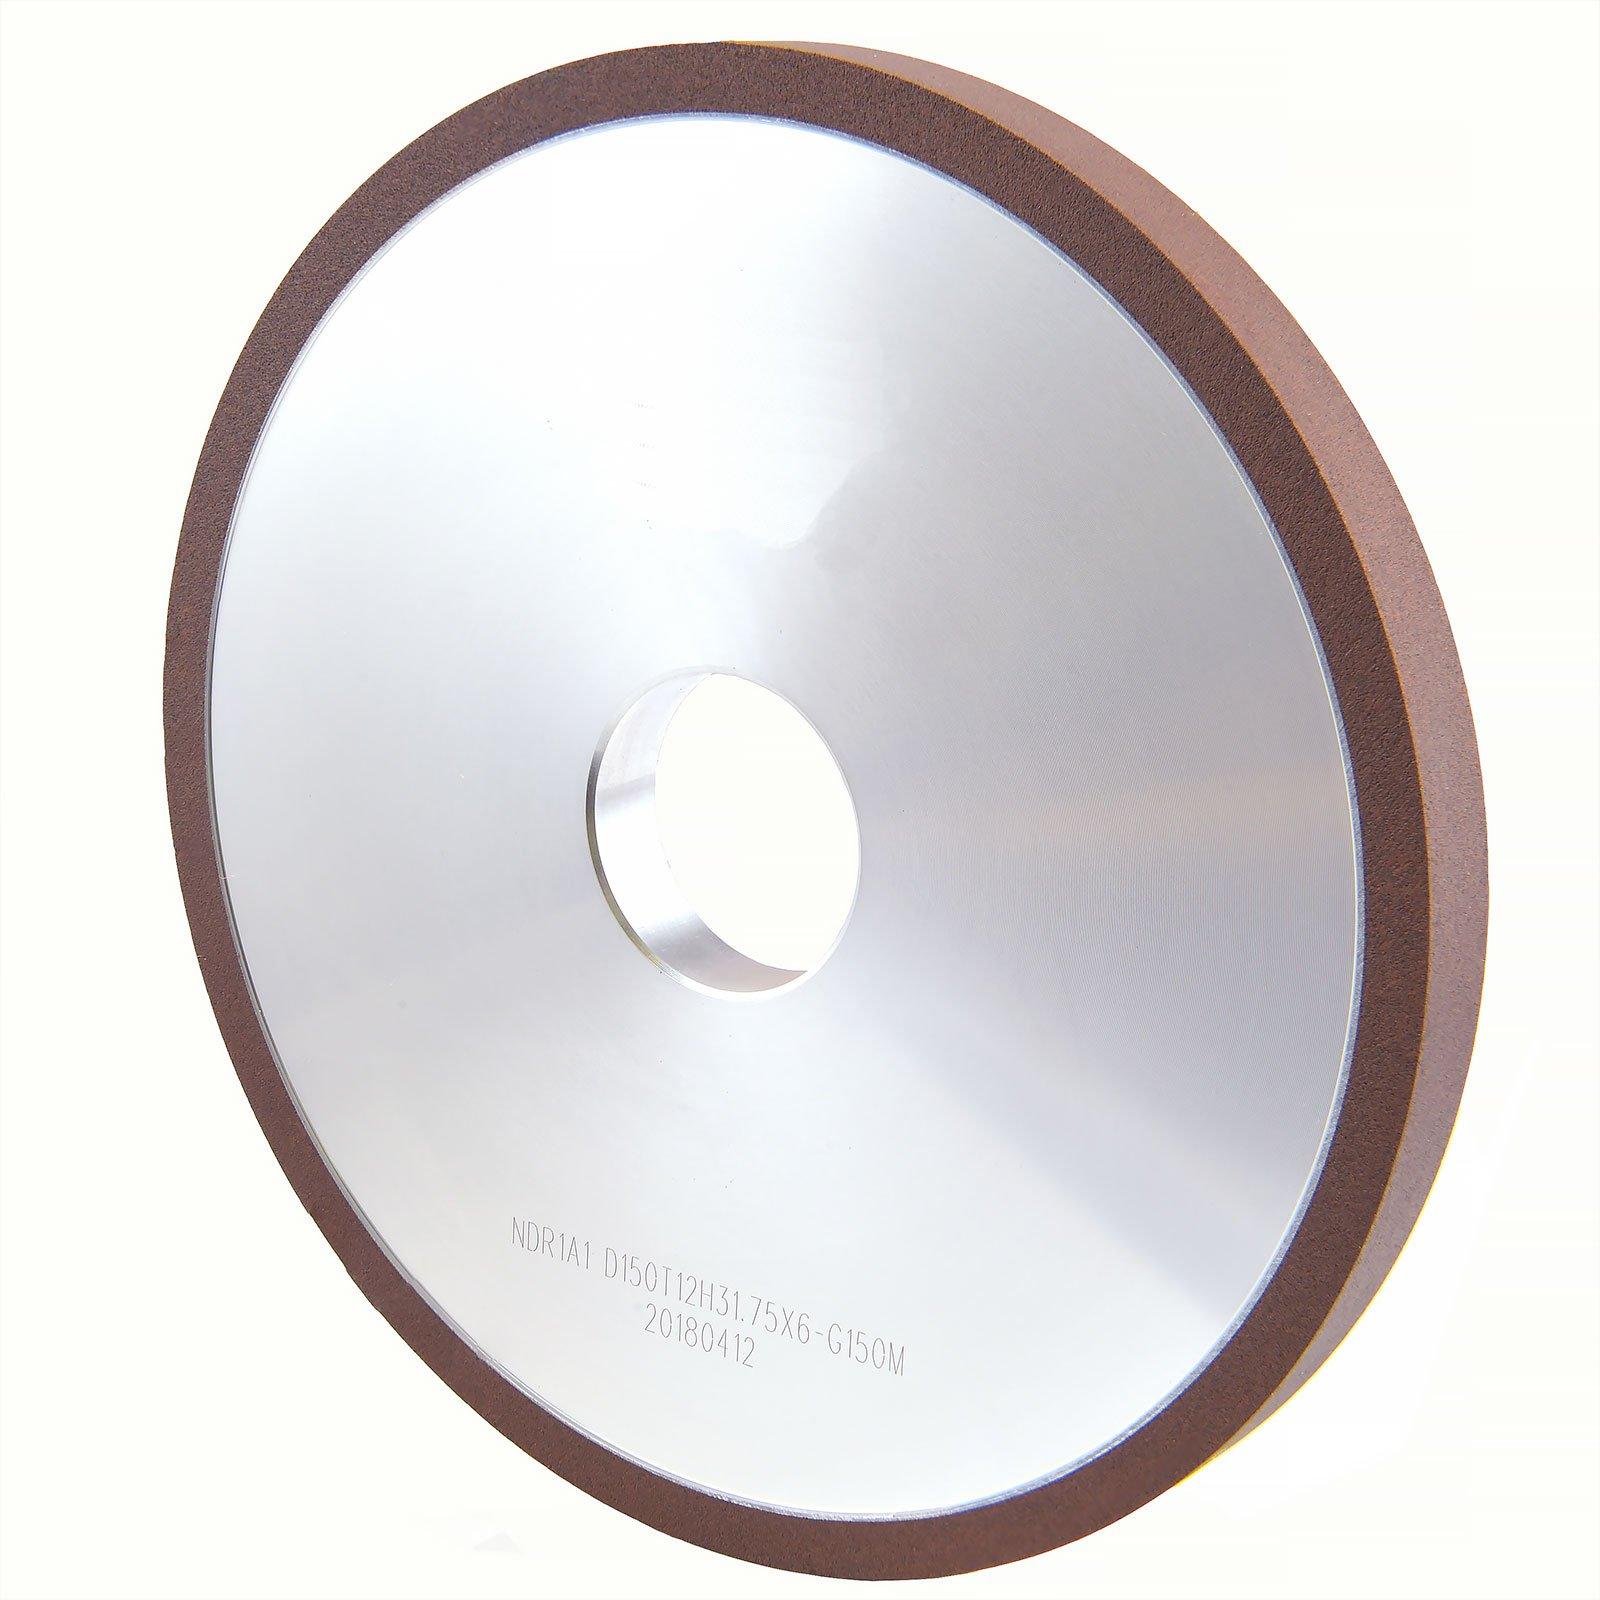 MaxTool NDR1A1D6T12X6G22 Diamond Plain wheels; OD 6''; Bore 1.25''; Thickness 0.50''; Grit 220; Resin Bond